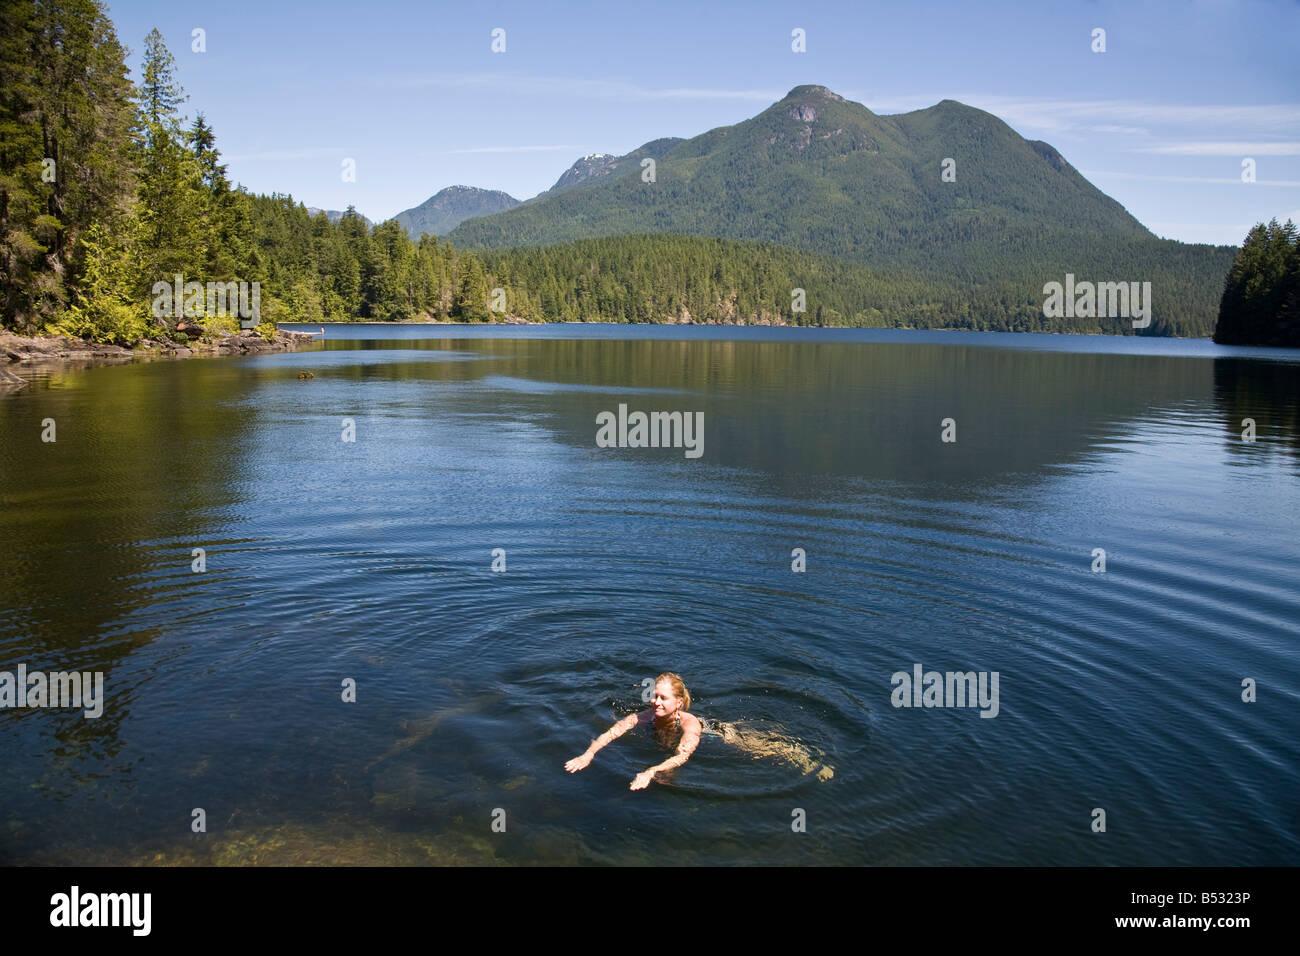 Unwin Lake Desolation Sound British Columbia Canada - Stock Image